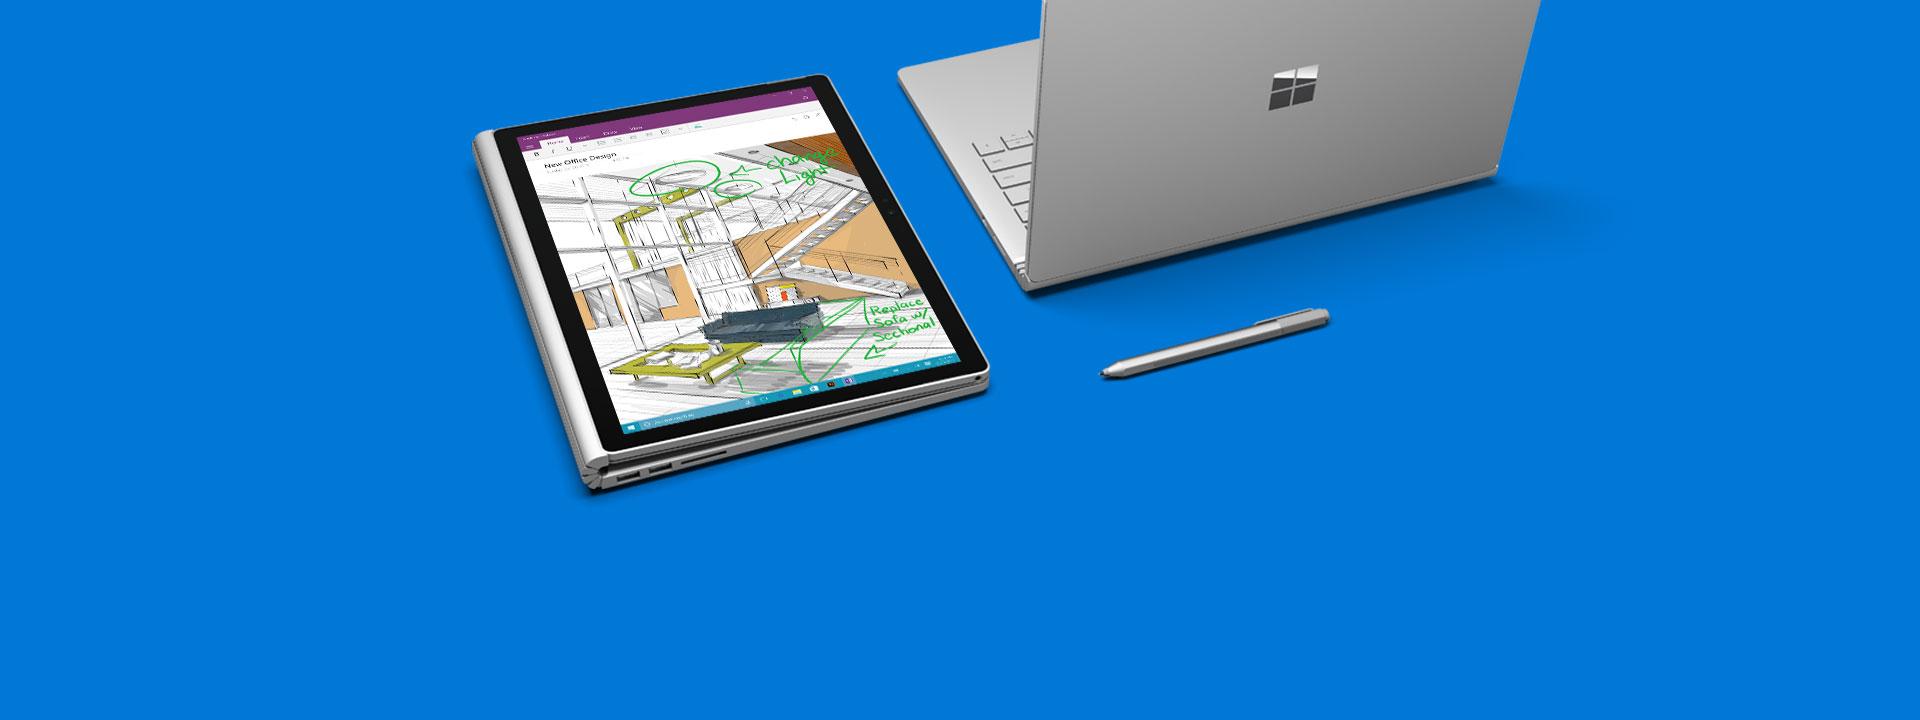 Surface Book;瞭解更多